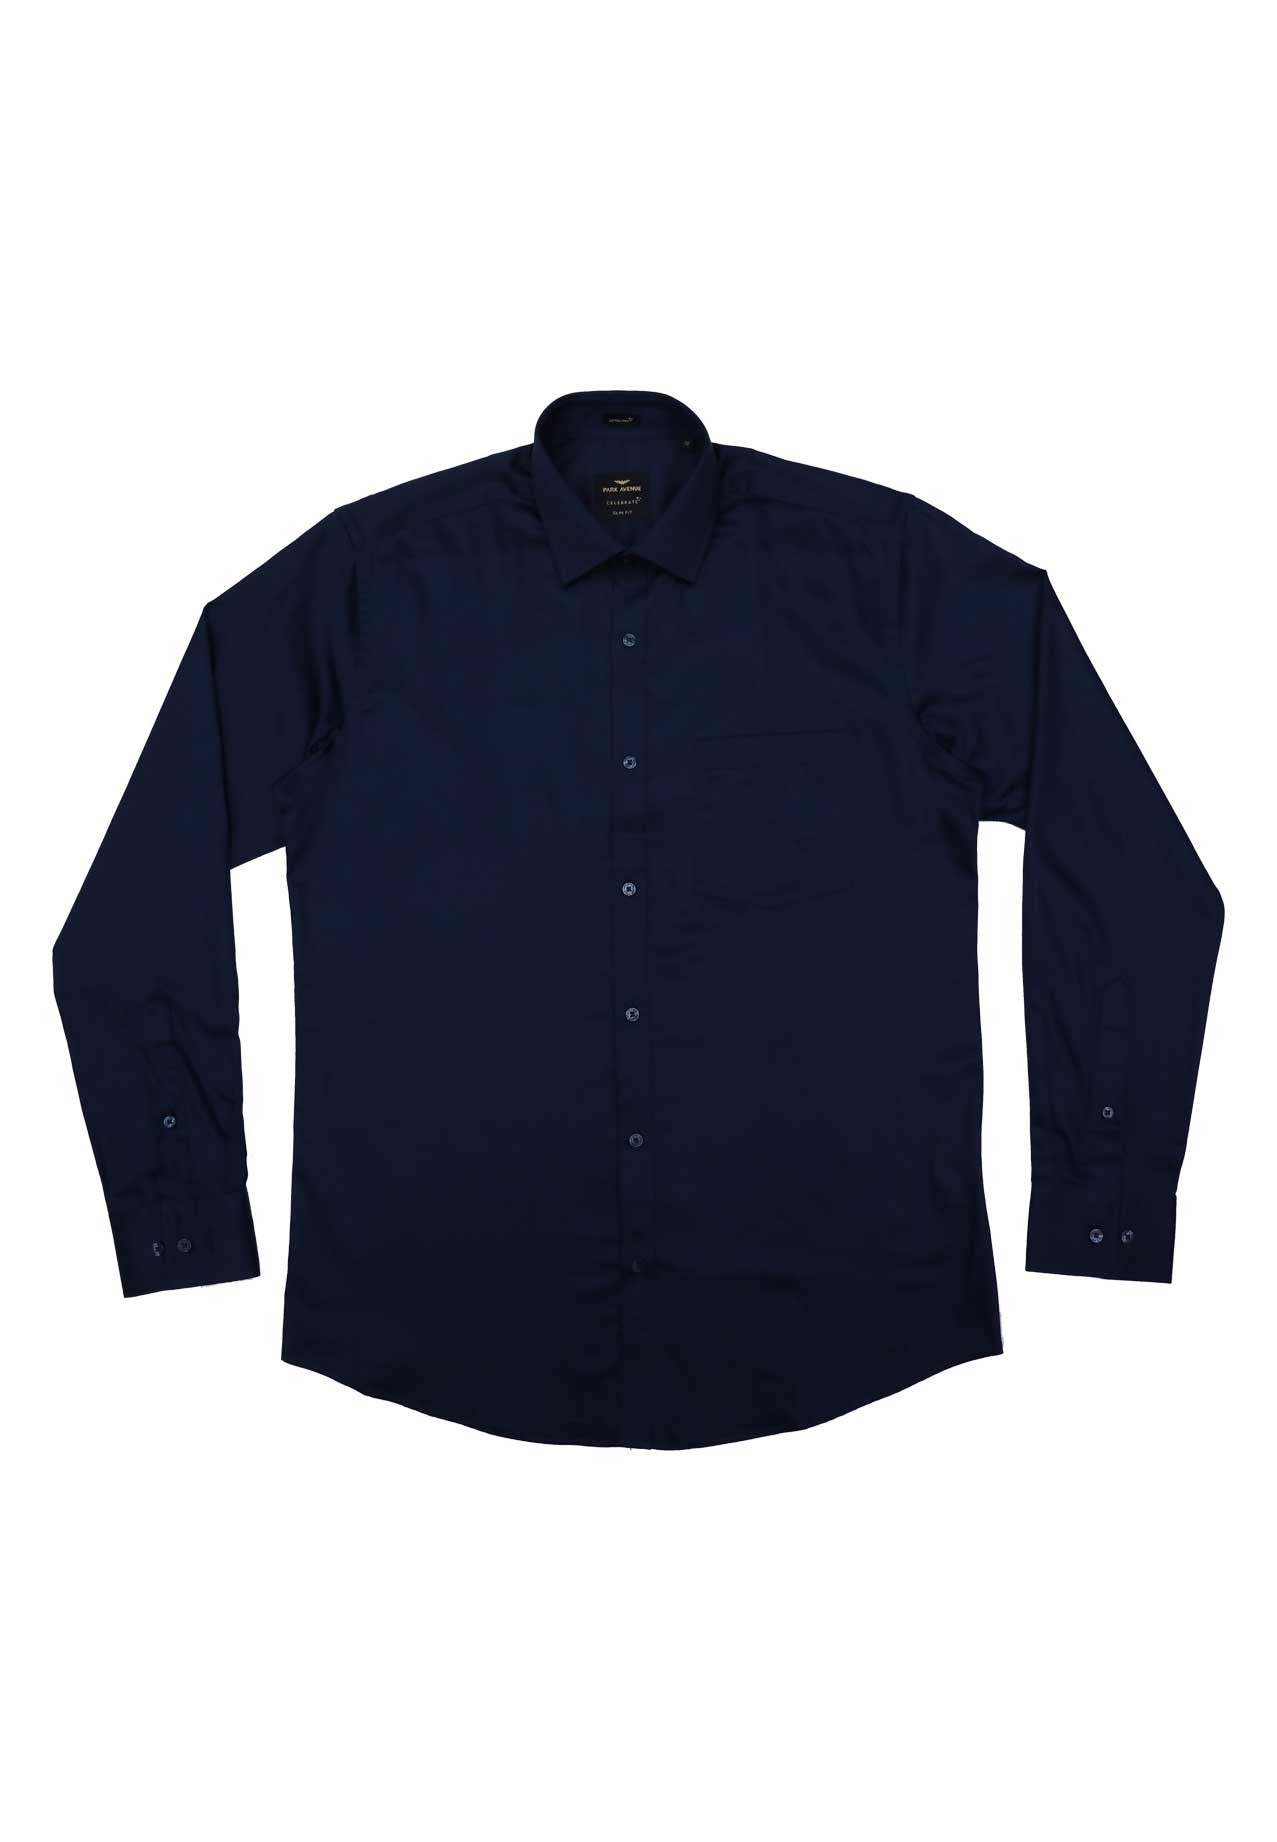 Park Avenue PISY00002-B8 Mens Shirt, Size 40